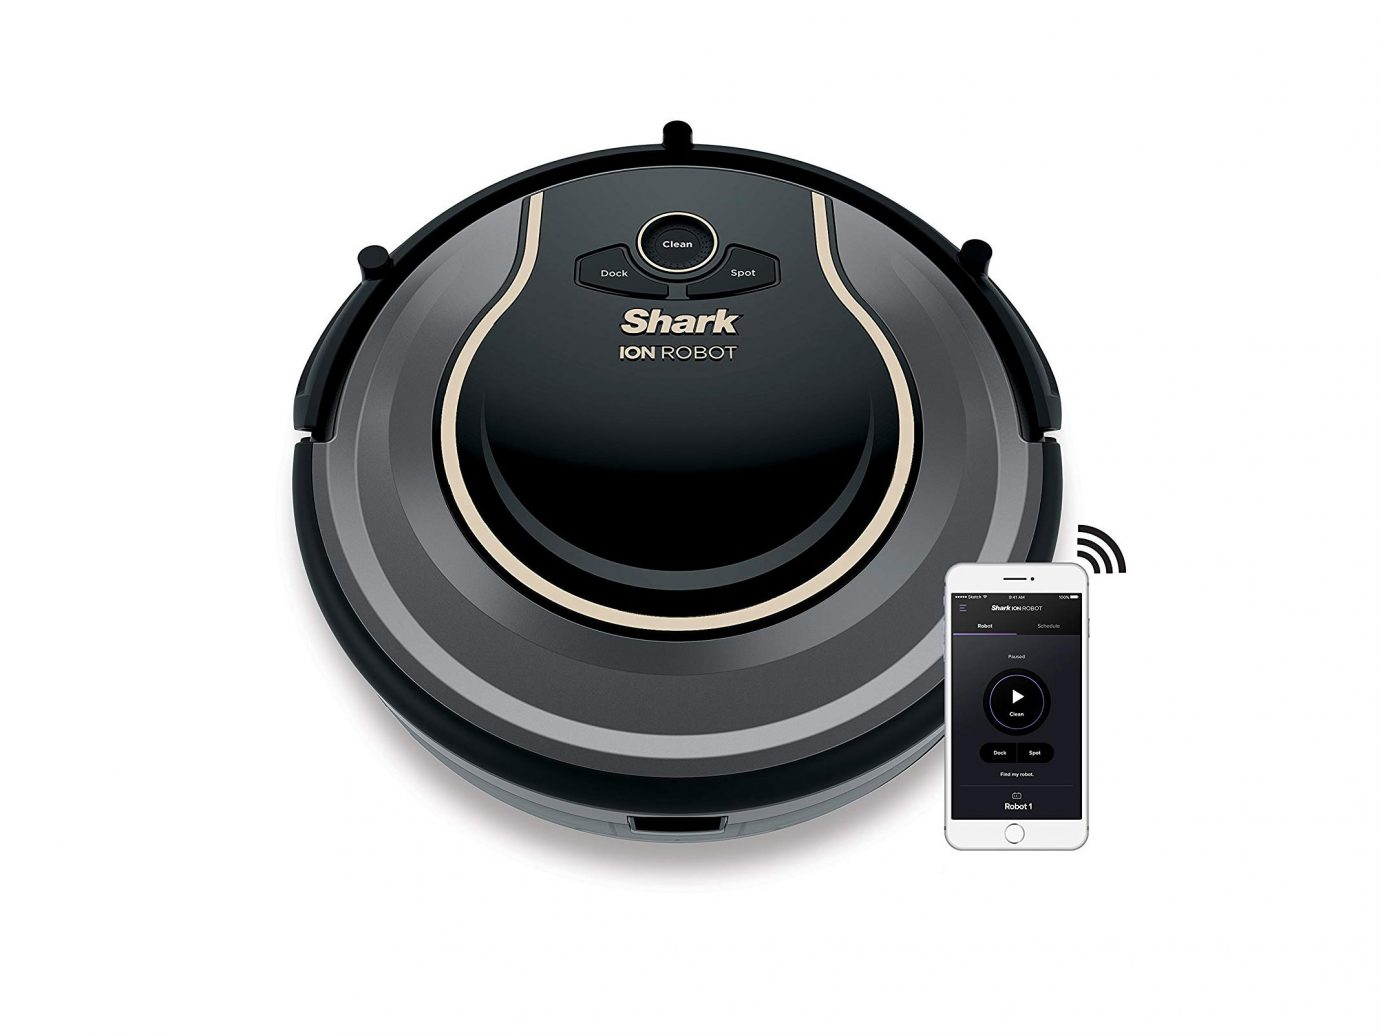 Shark Ion Robotic vacuum